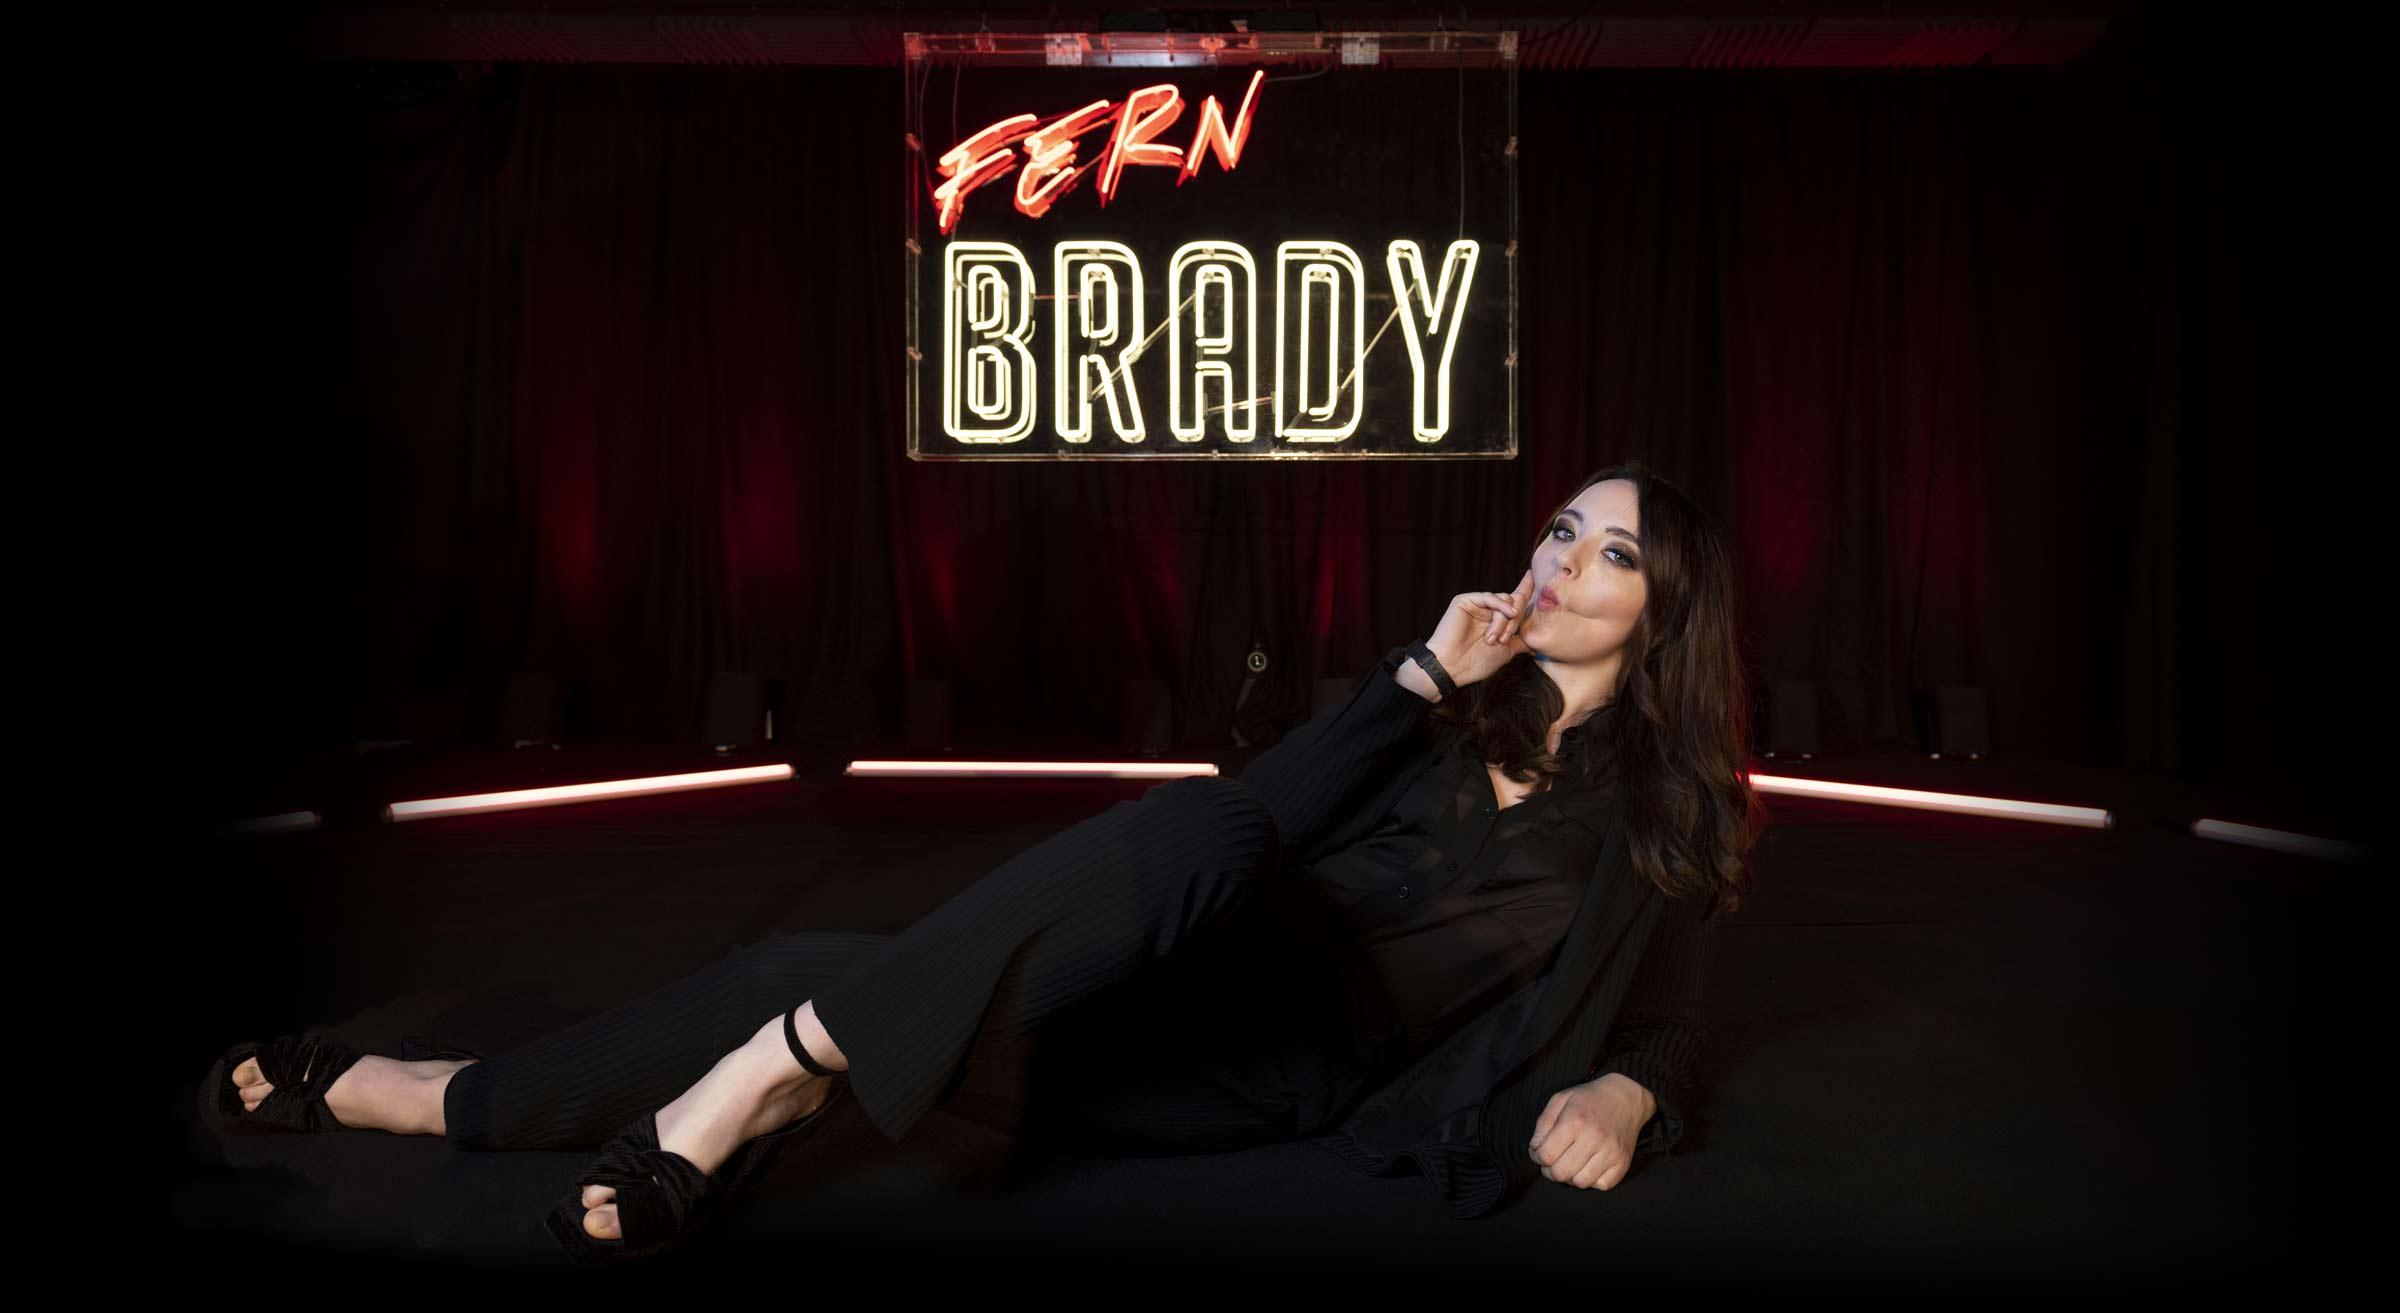 Fern Brady - Stand up comedian